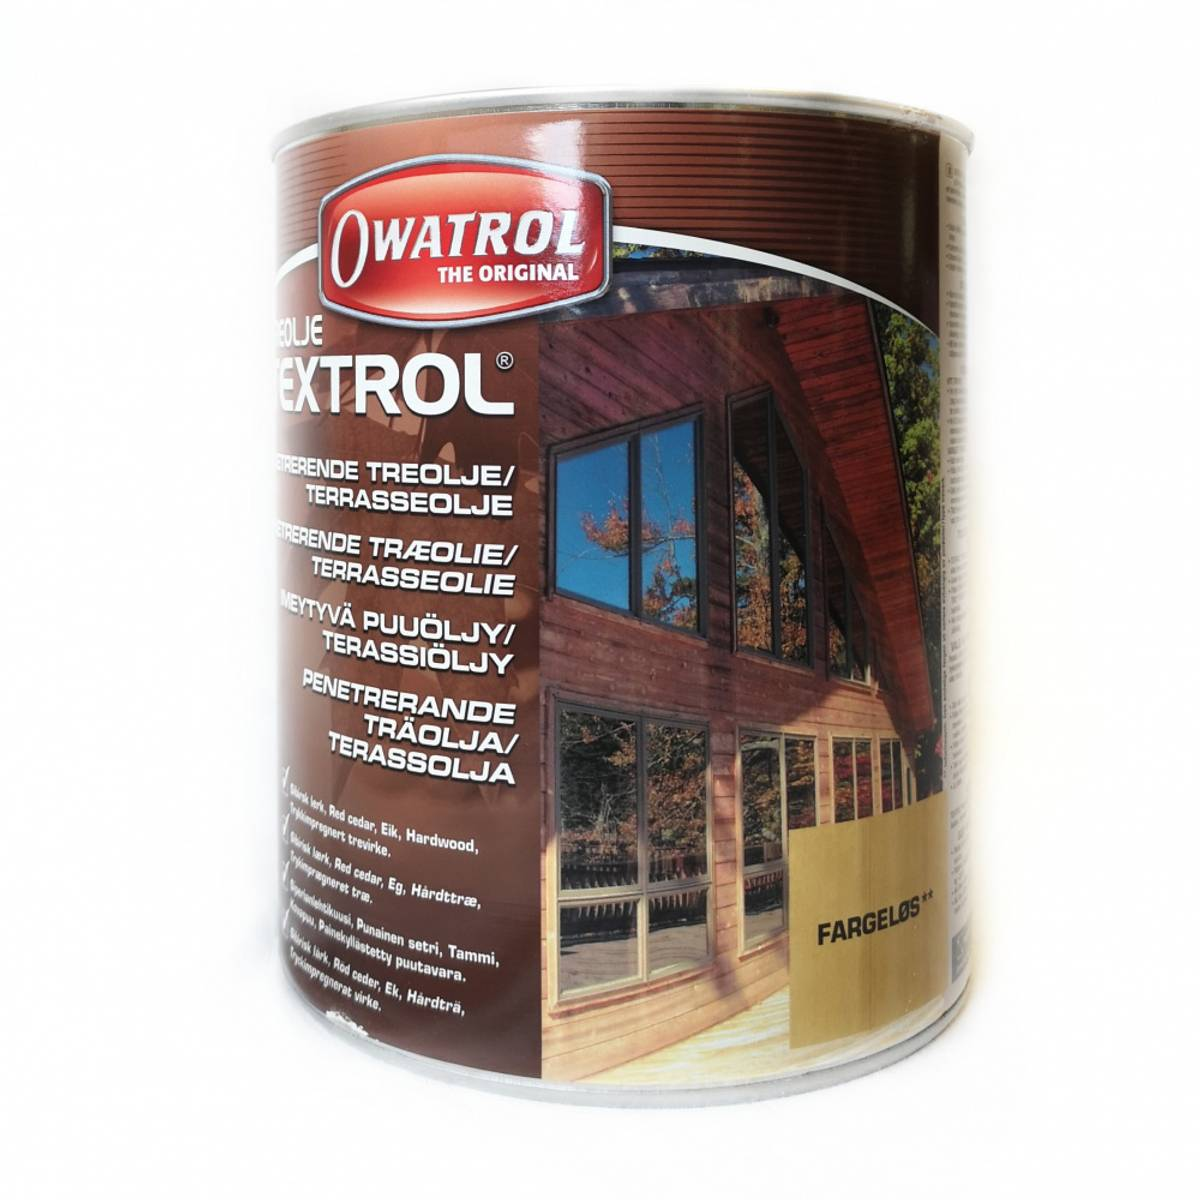 Owatrol Textrol Treolje 2,5 l Fargeløs